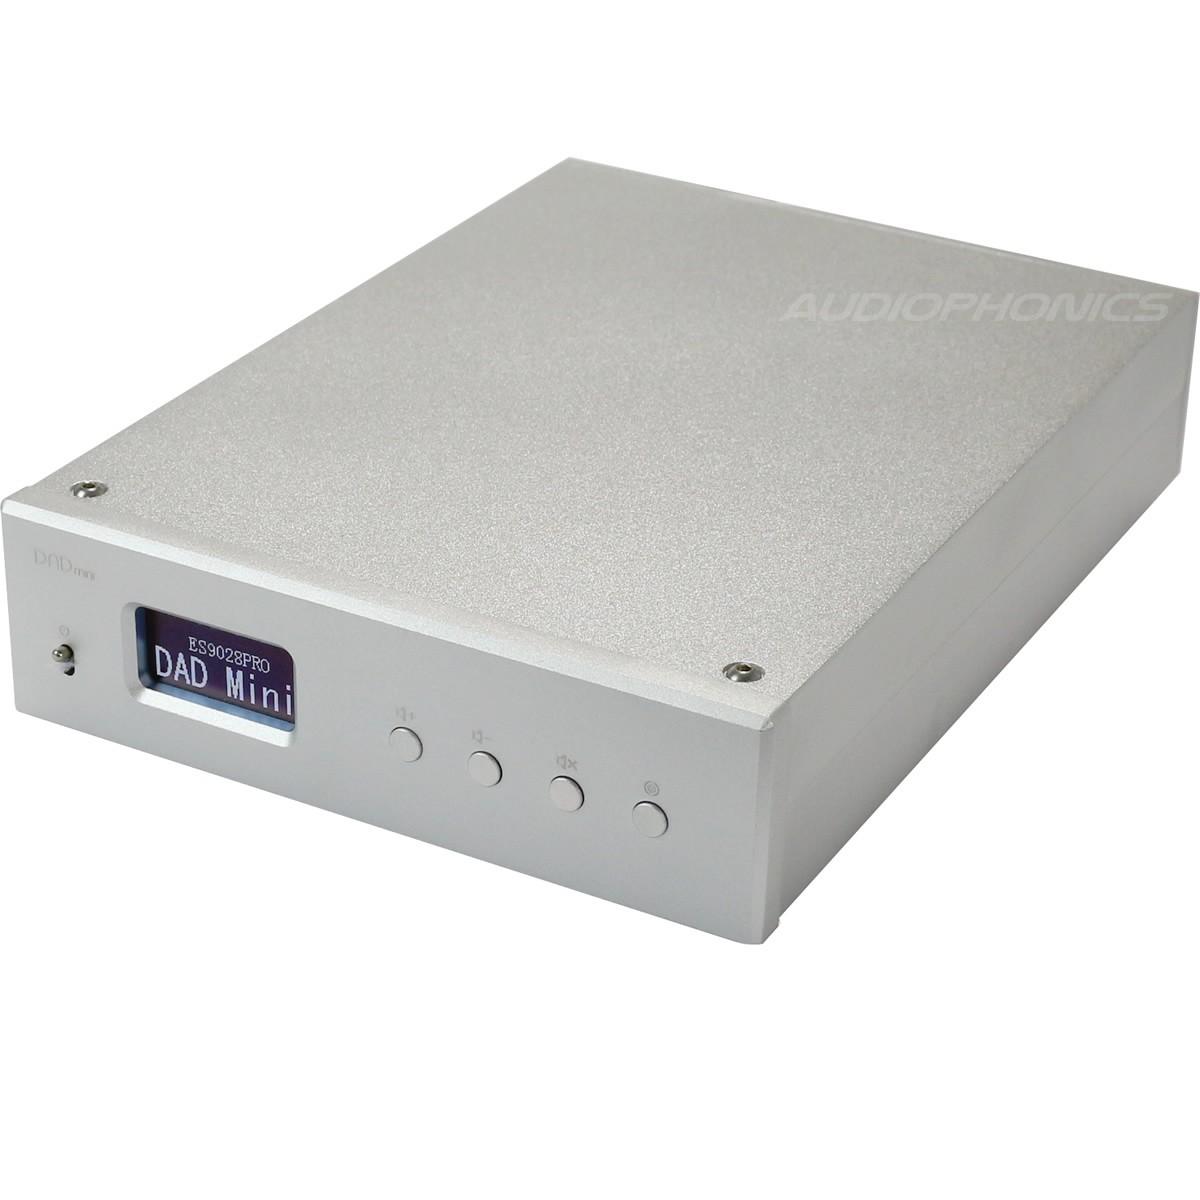 JA DAD MINI USB BALANCED DAC ES9028 PRO XLR 32bit/384kHz DSD 256 XMOS